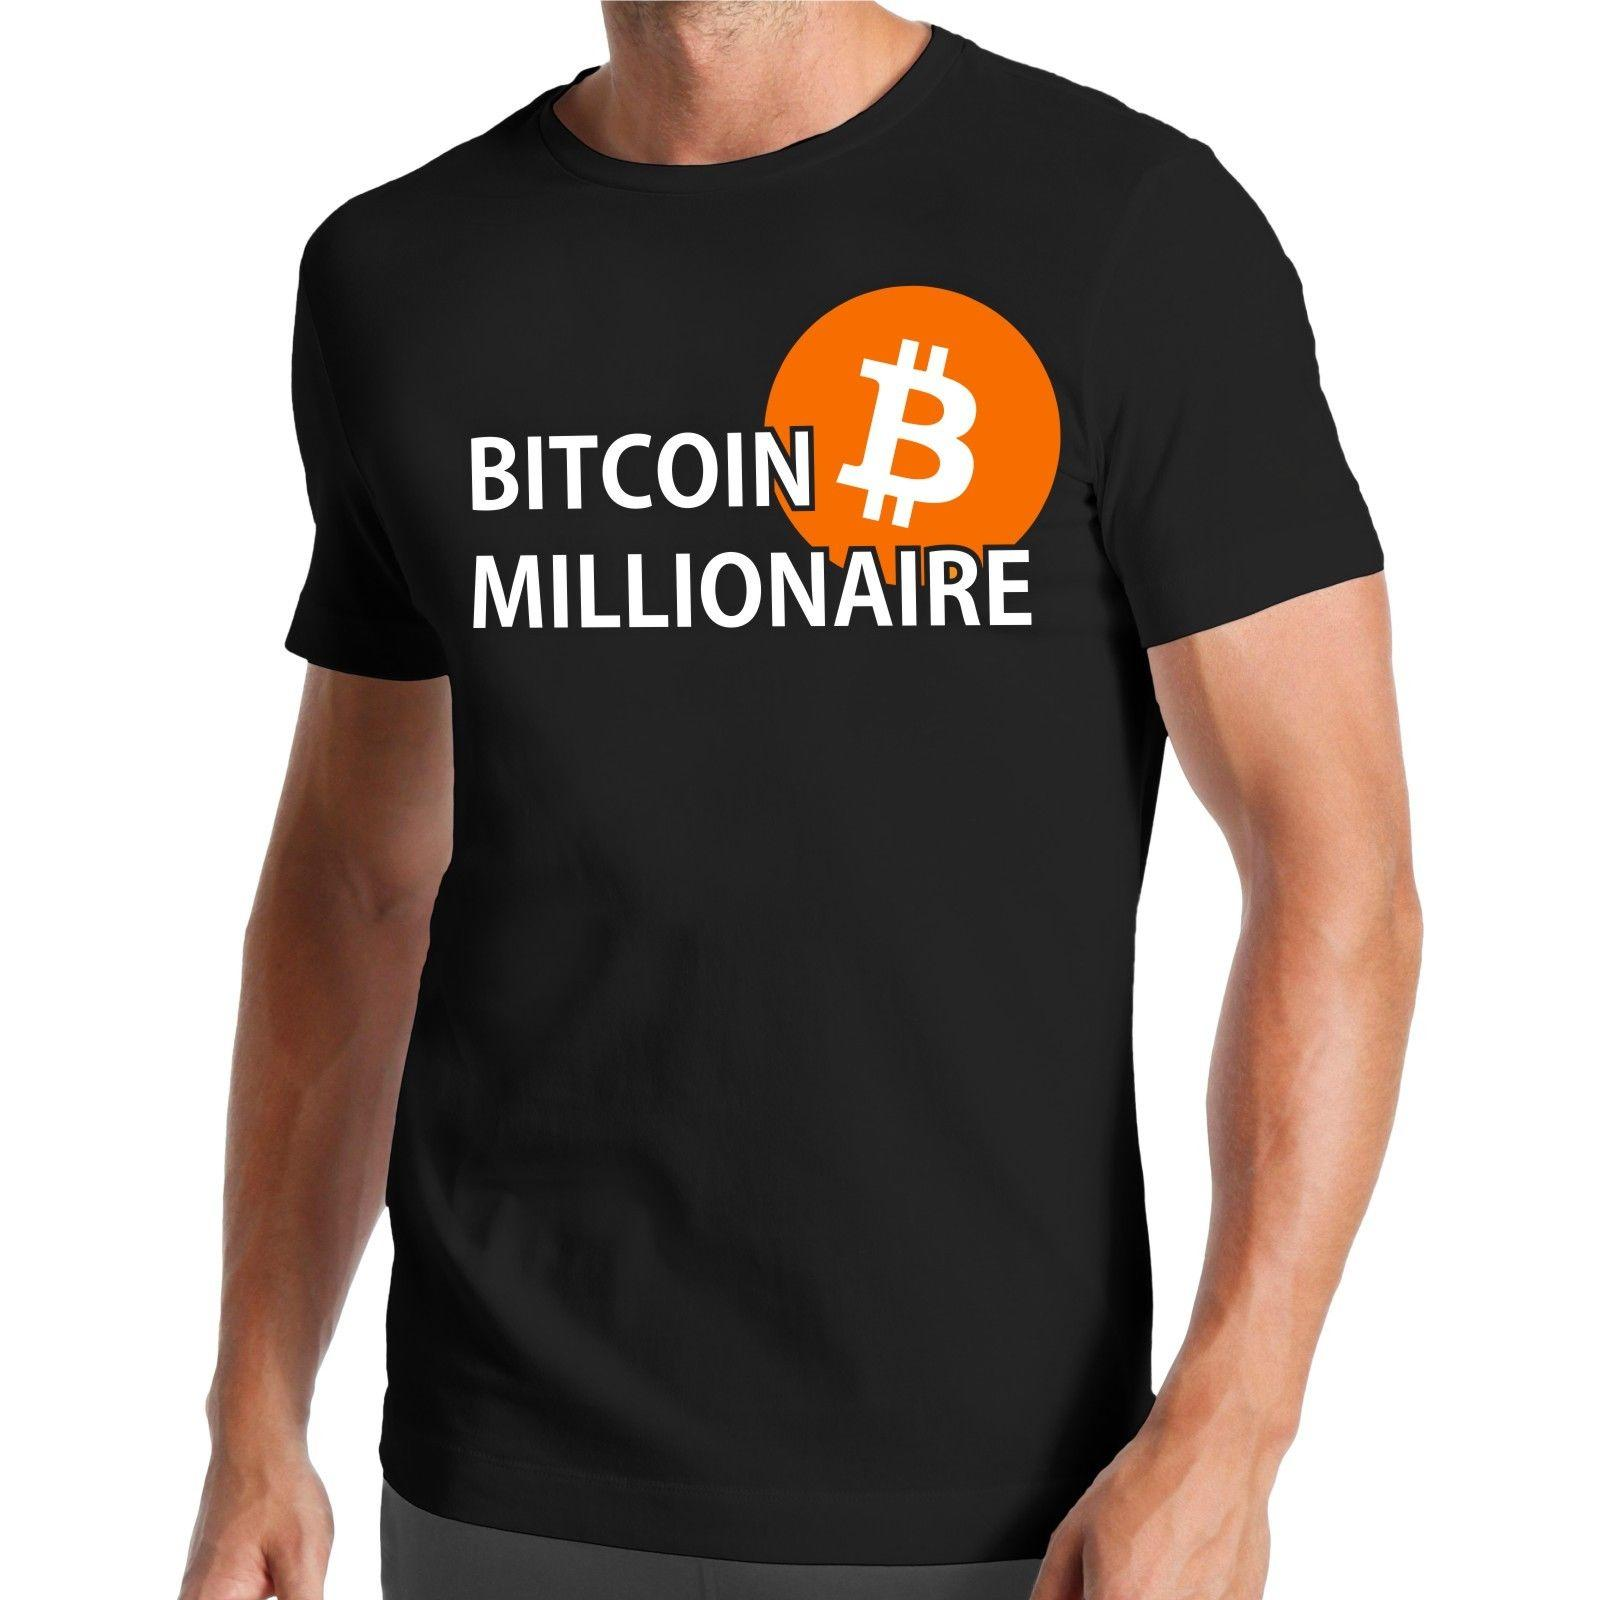 acdaddbf Bitcoin Millionaire T Shirt Millionär Börse Stock Exchange Krypto Crypto  Funny Unisex Casual Tshirt Denim Shirts Design T Shirts From  Sillyboytshirts, ...